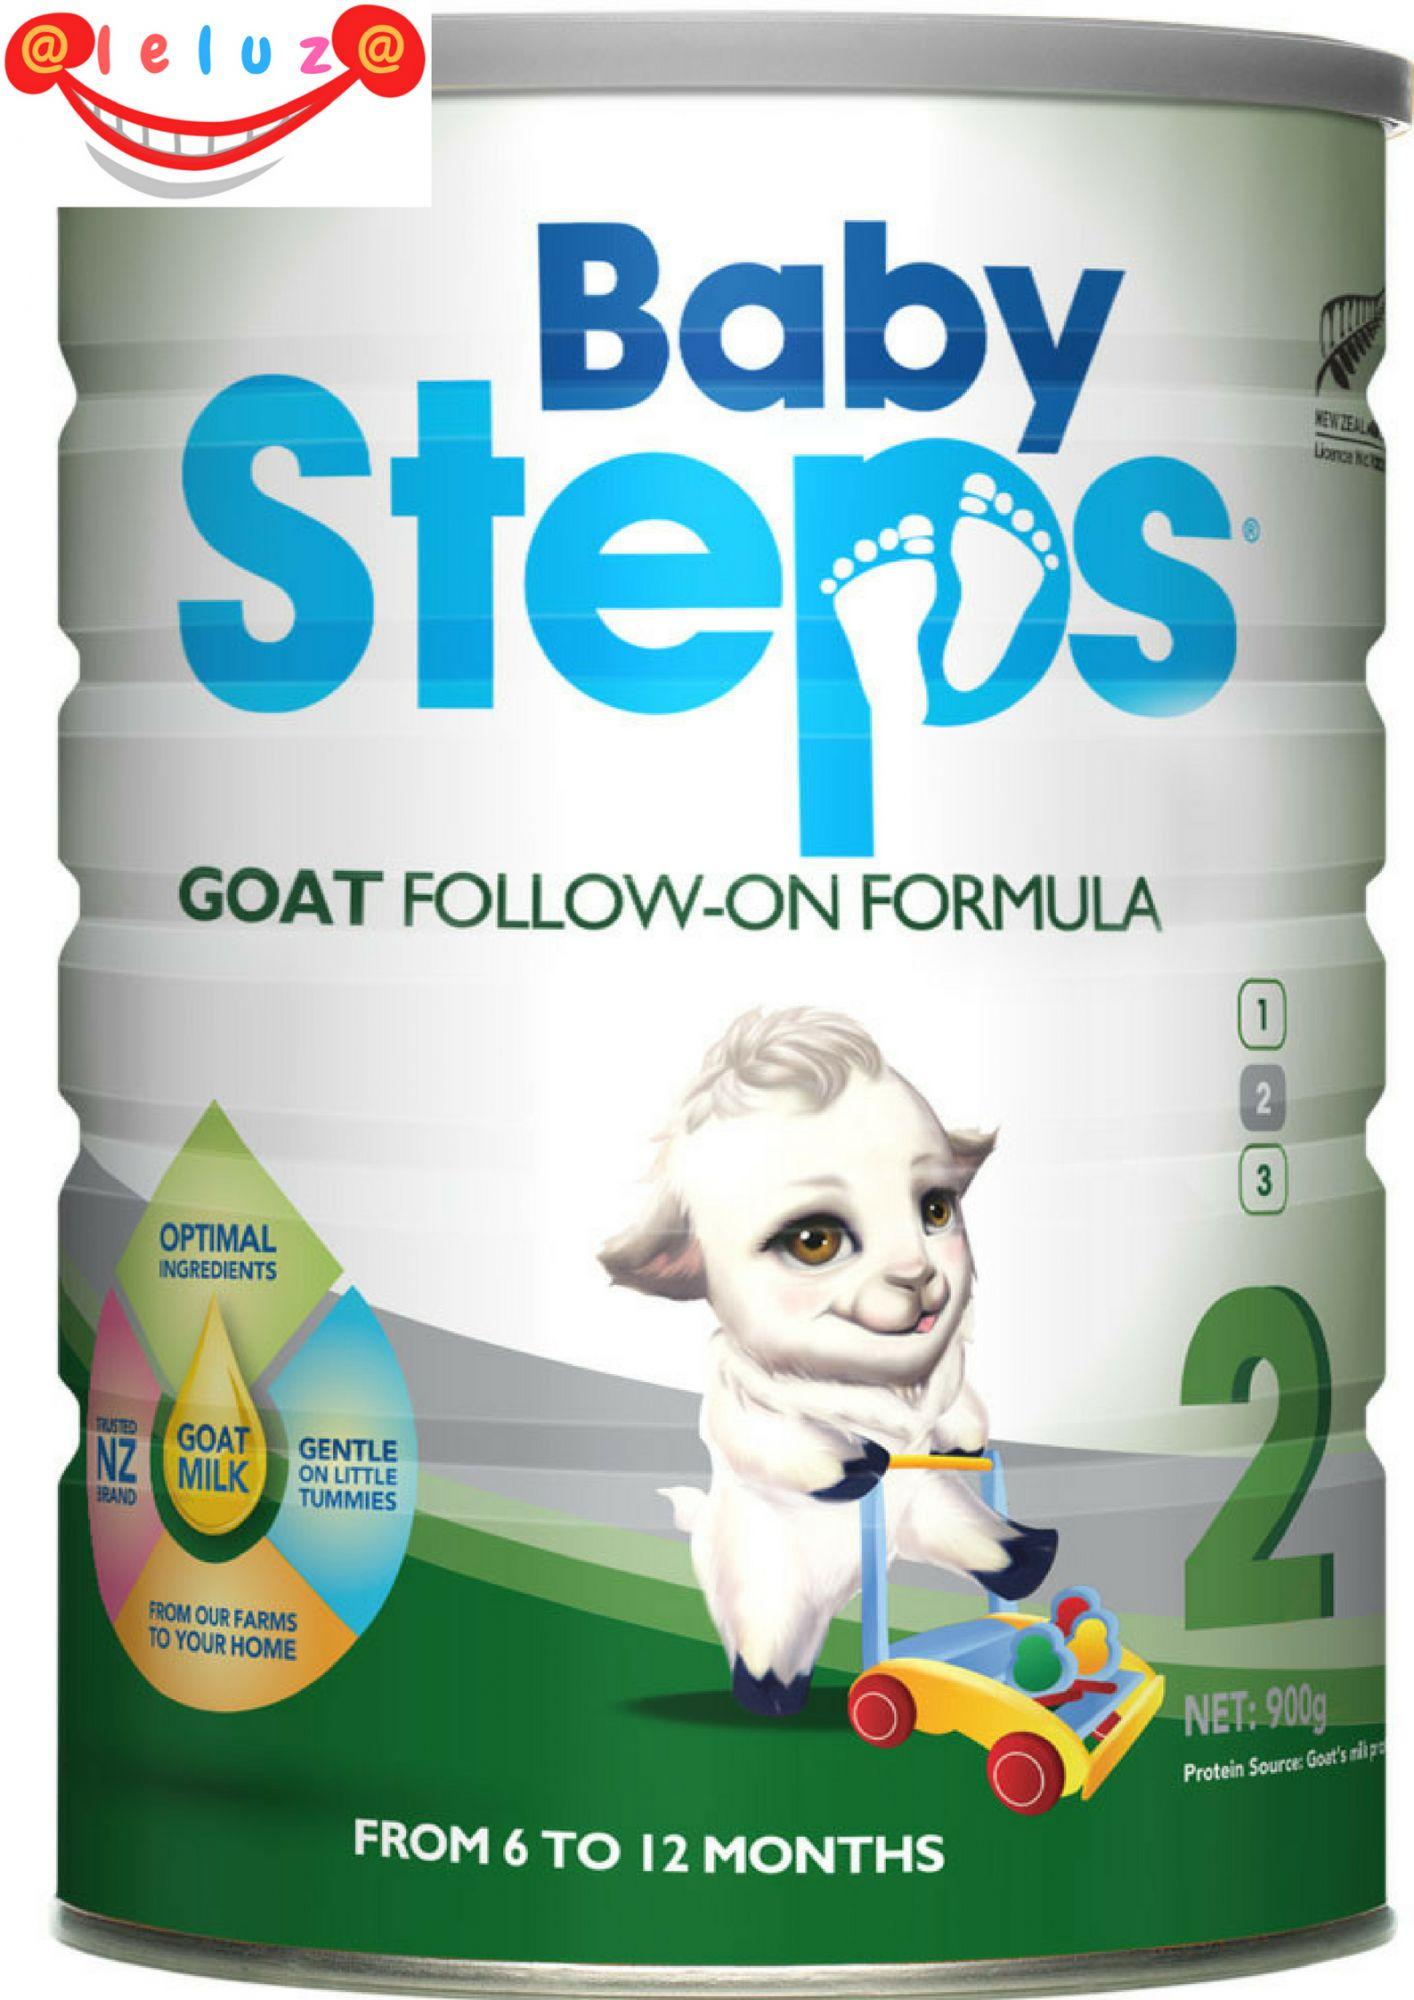 Sữa dê cao cấp Baby Steps số 2 FOLLOW-ON FORMULA